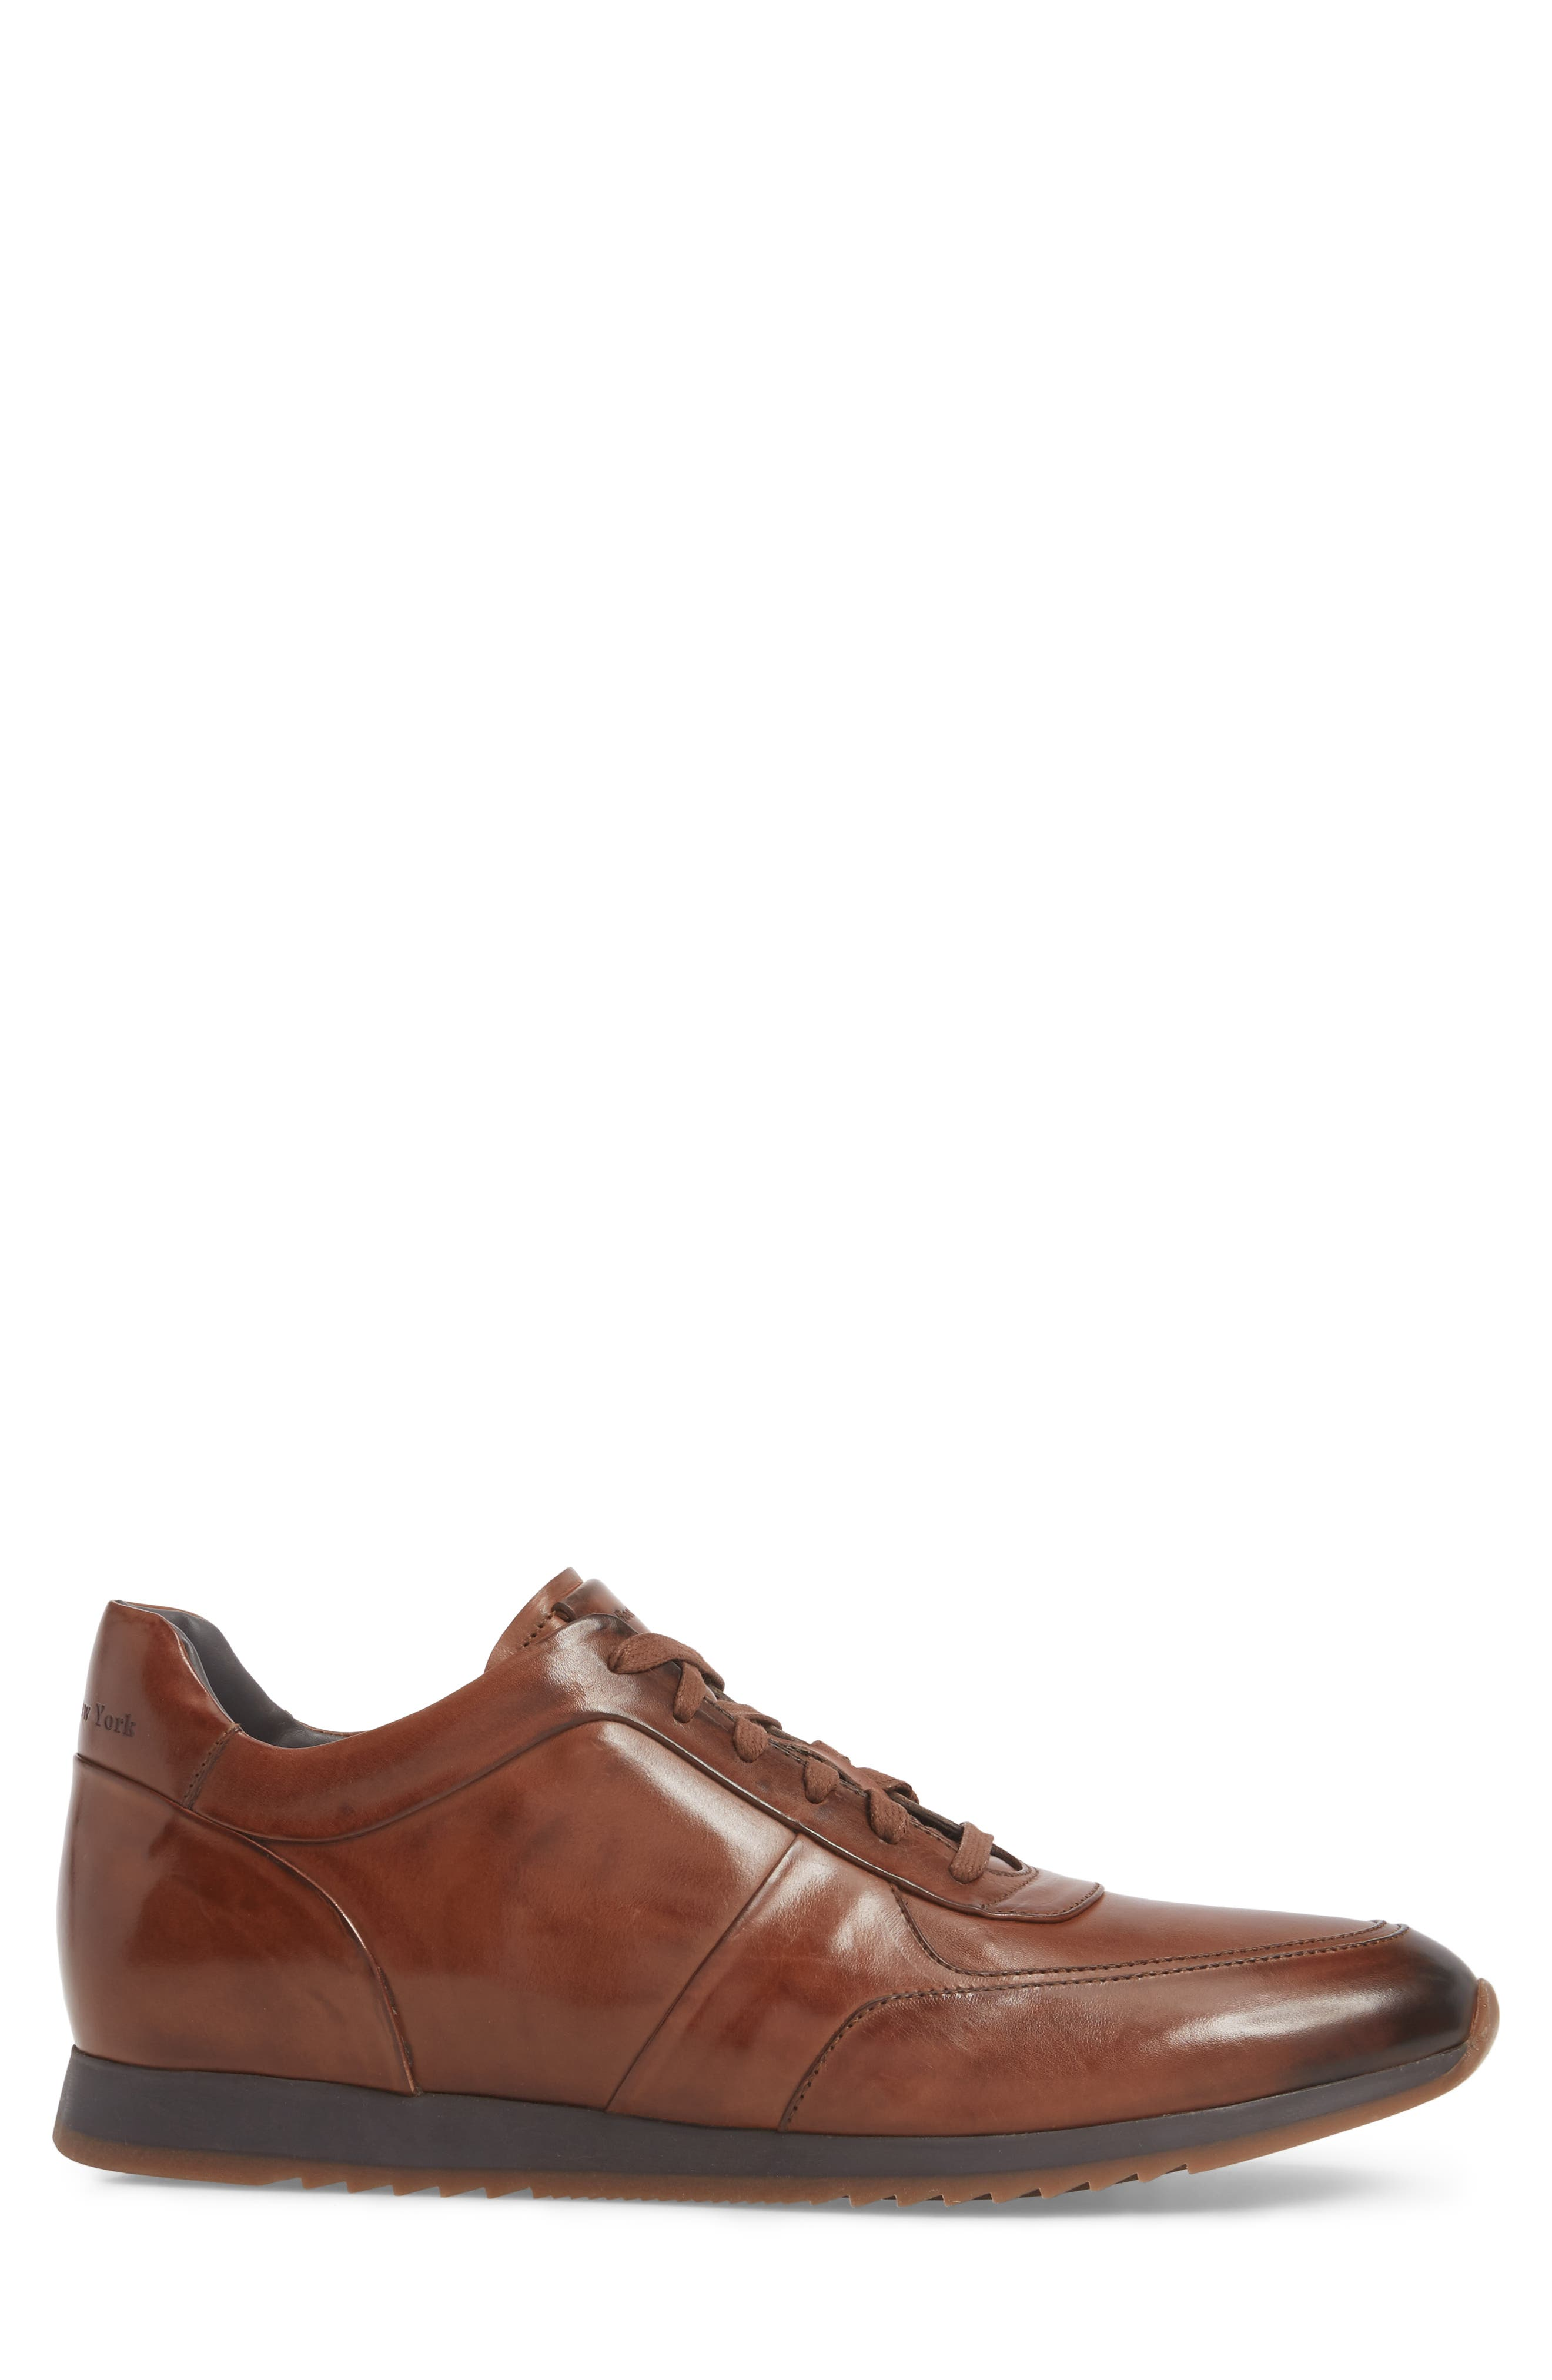 Lenox Low Top Sneaker,                             Alternate thumbnail 3, color,                             Tan Leather